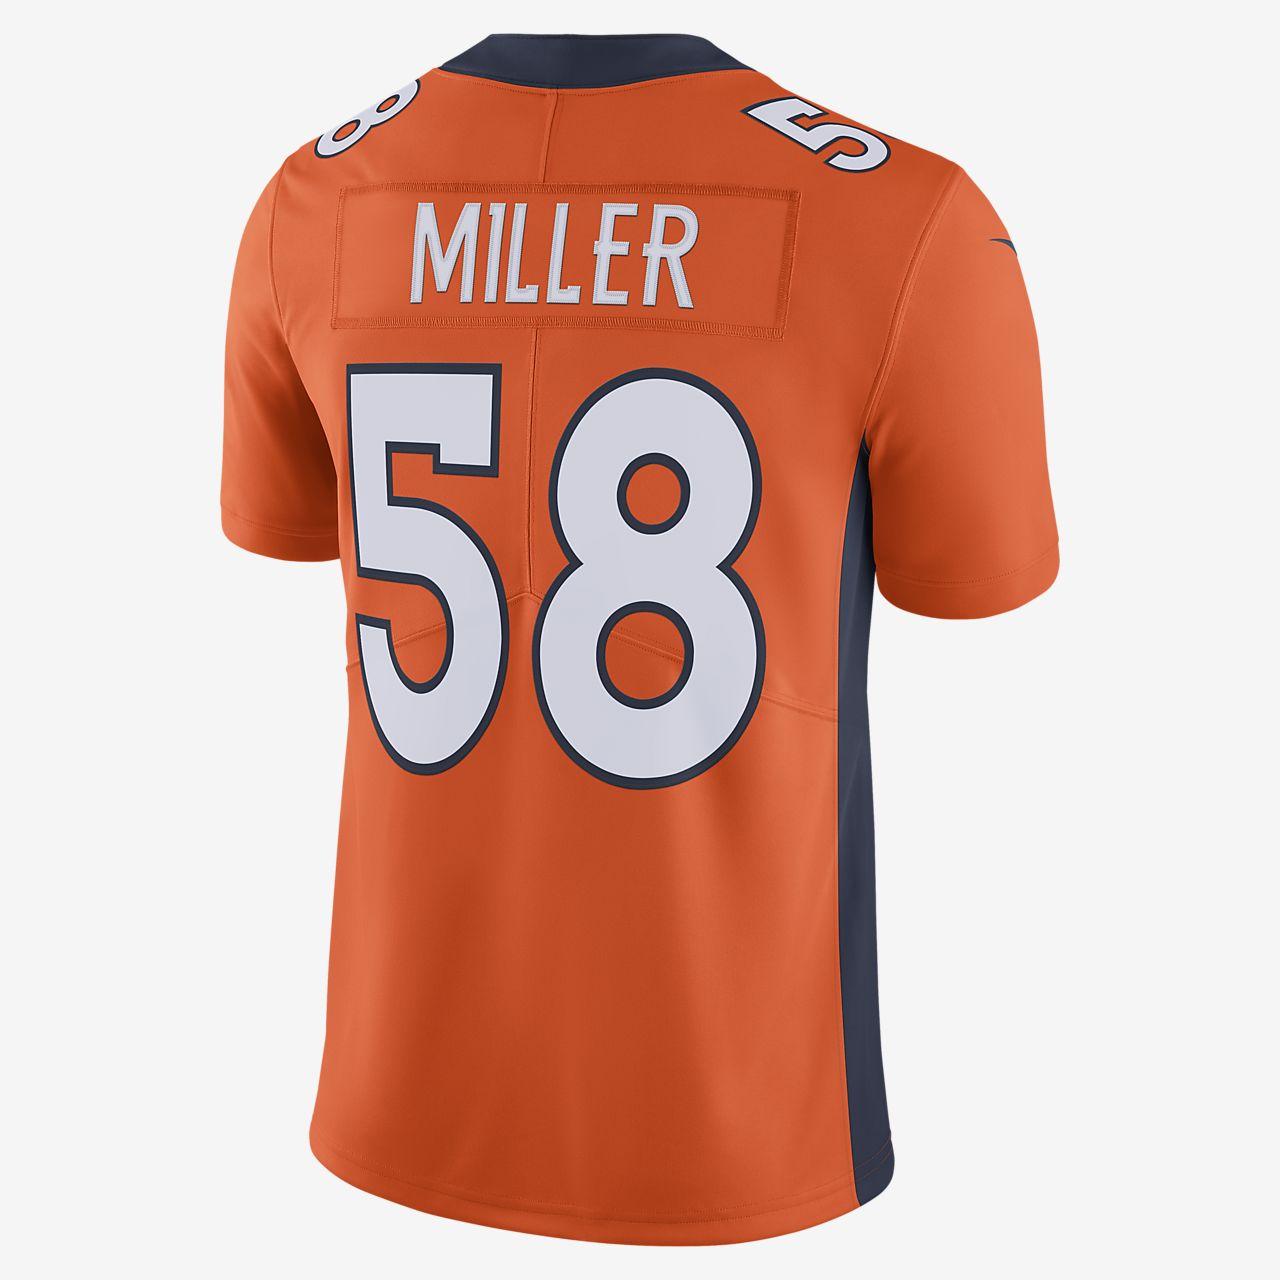 2b05602bc8b ... NFL Denver Broncos (Von Miller) Men's Football Home Limited Jersey